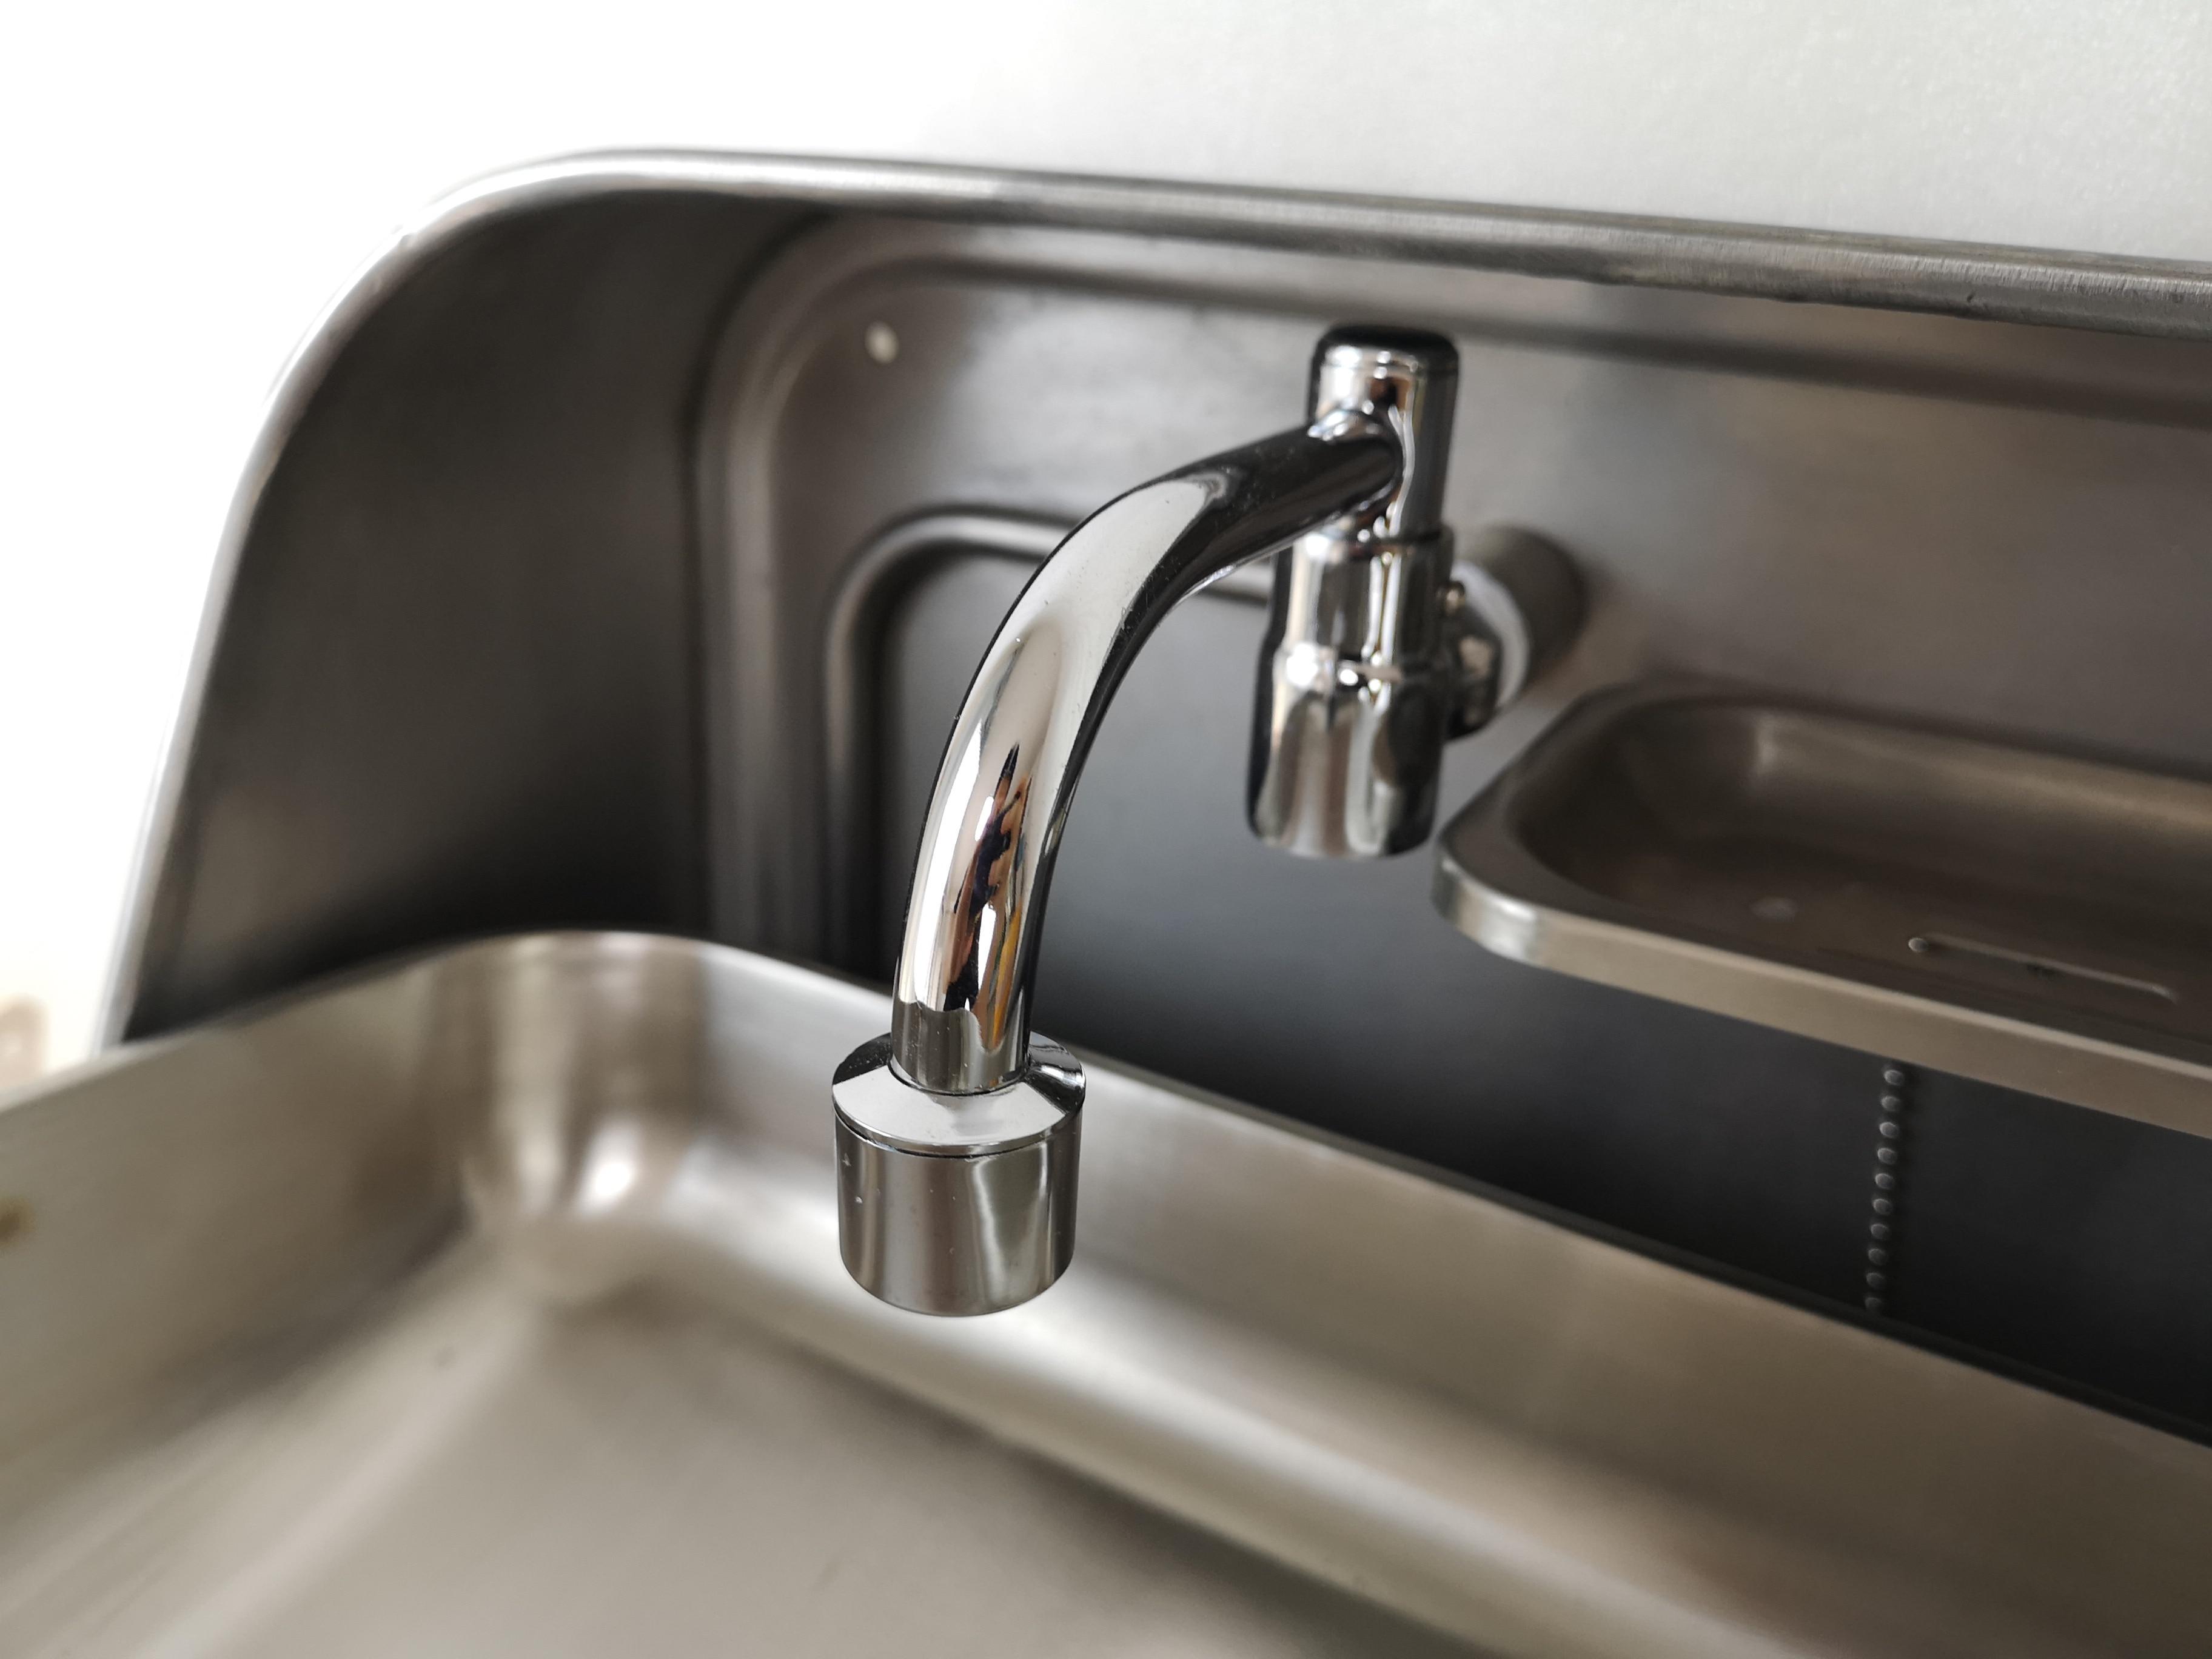 RV Stainless Steel Hand Wash Basin Folding Sink Integrated Faucet Boat yachts van camper trailer Caravan accessories 370*390*375 enlarge